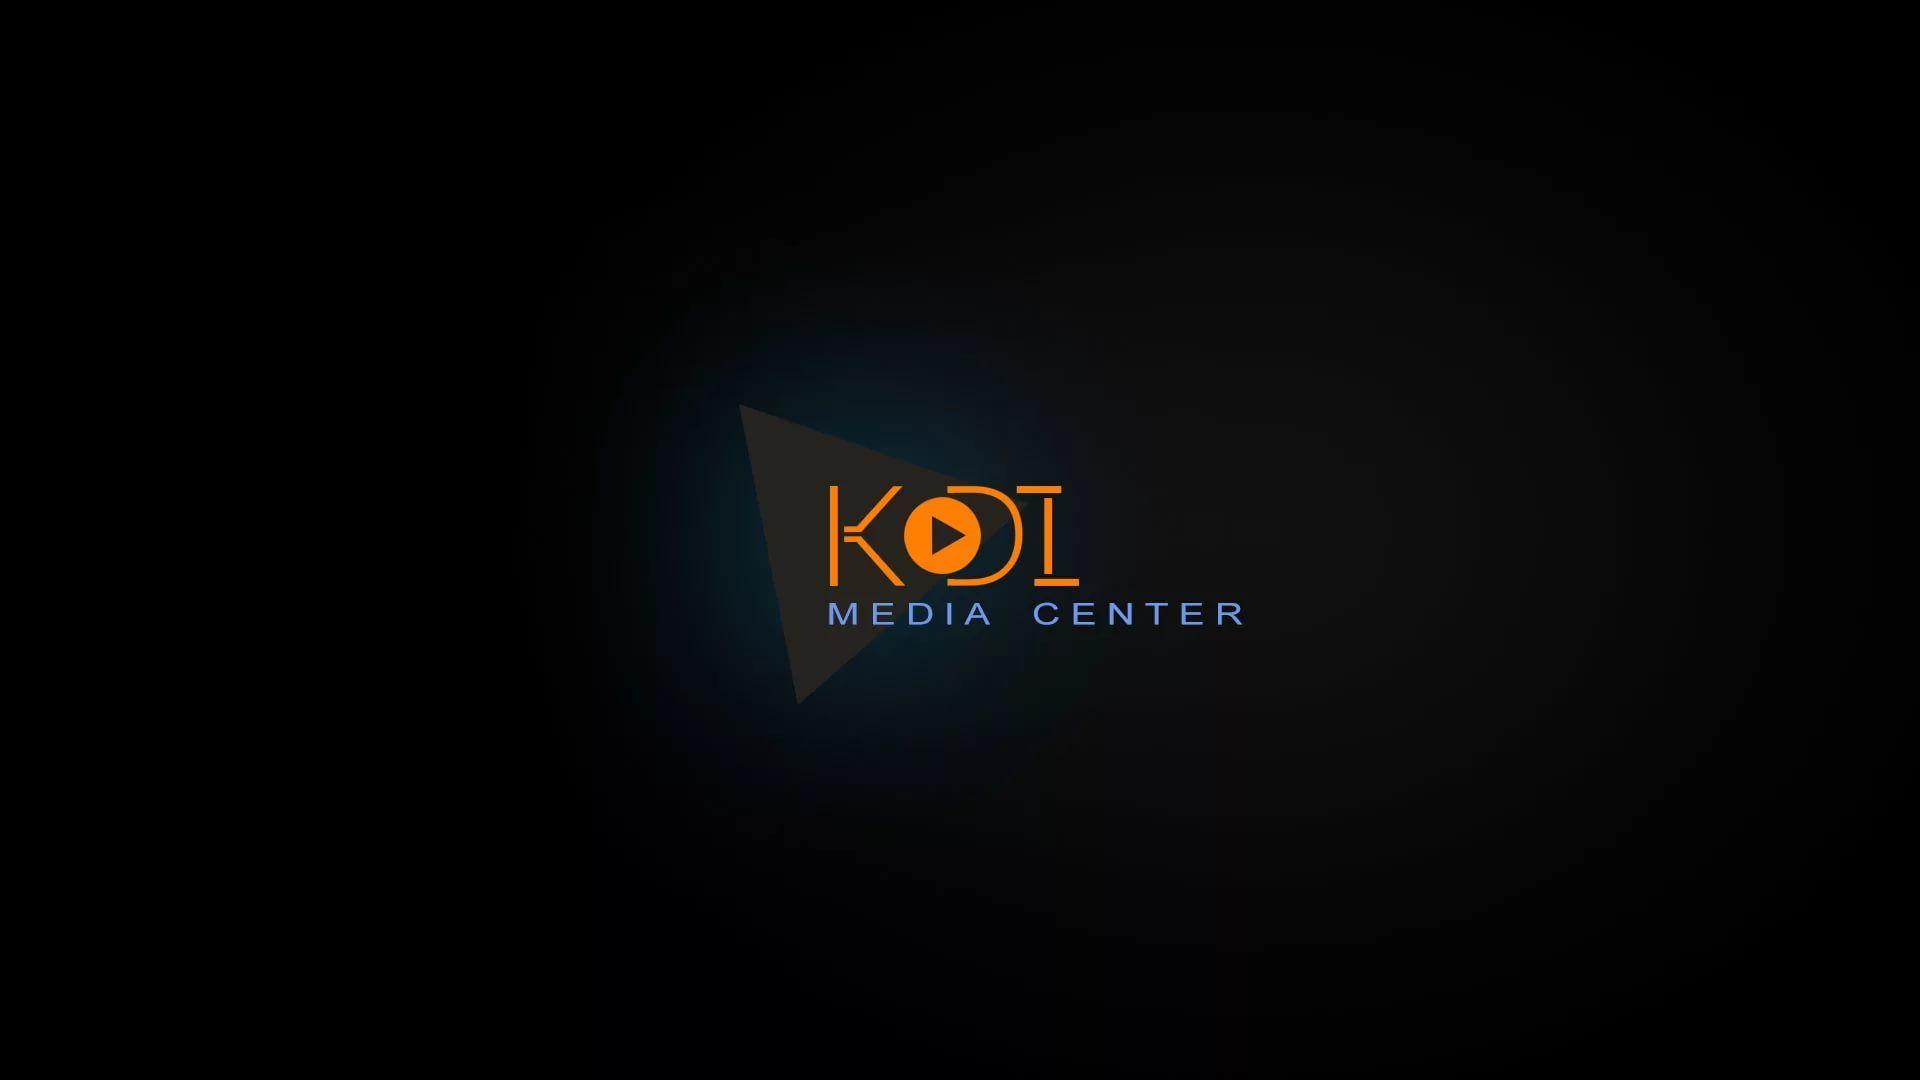 Kodi good wallpaper hd